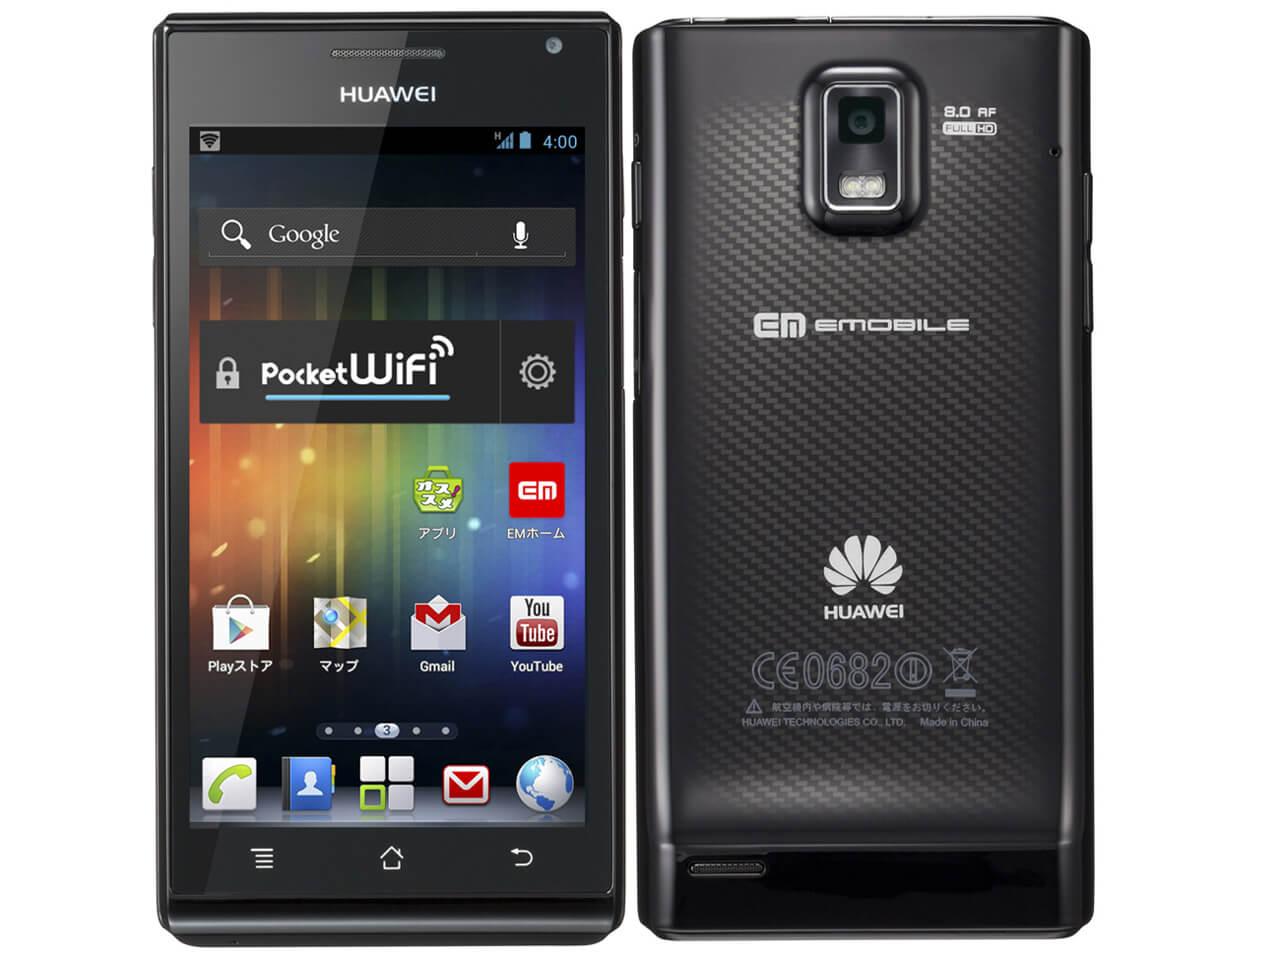 YMOBILE Huawei GS03